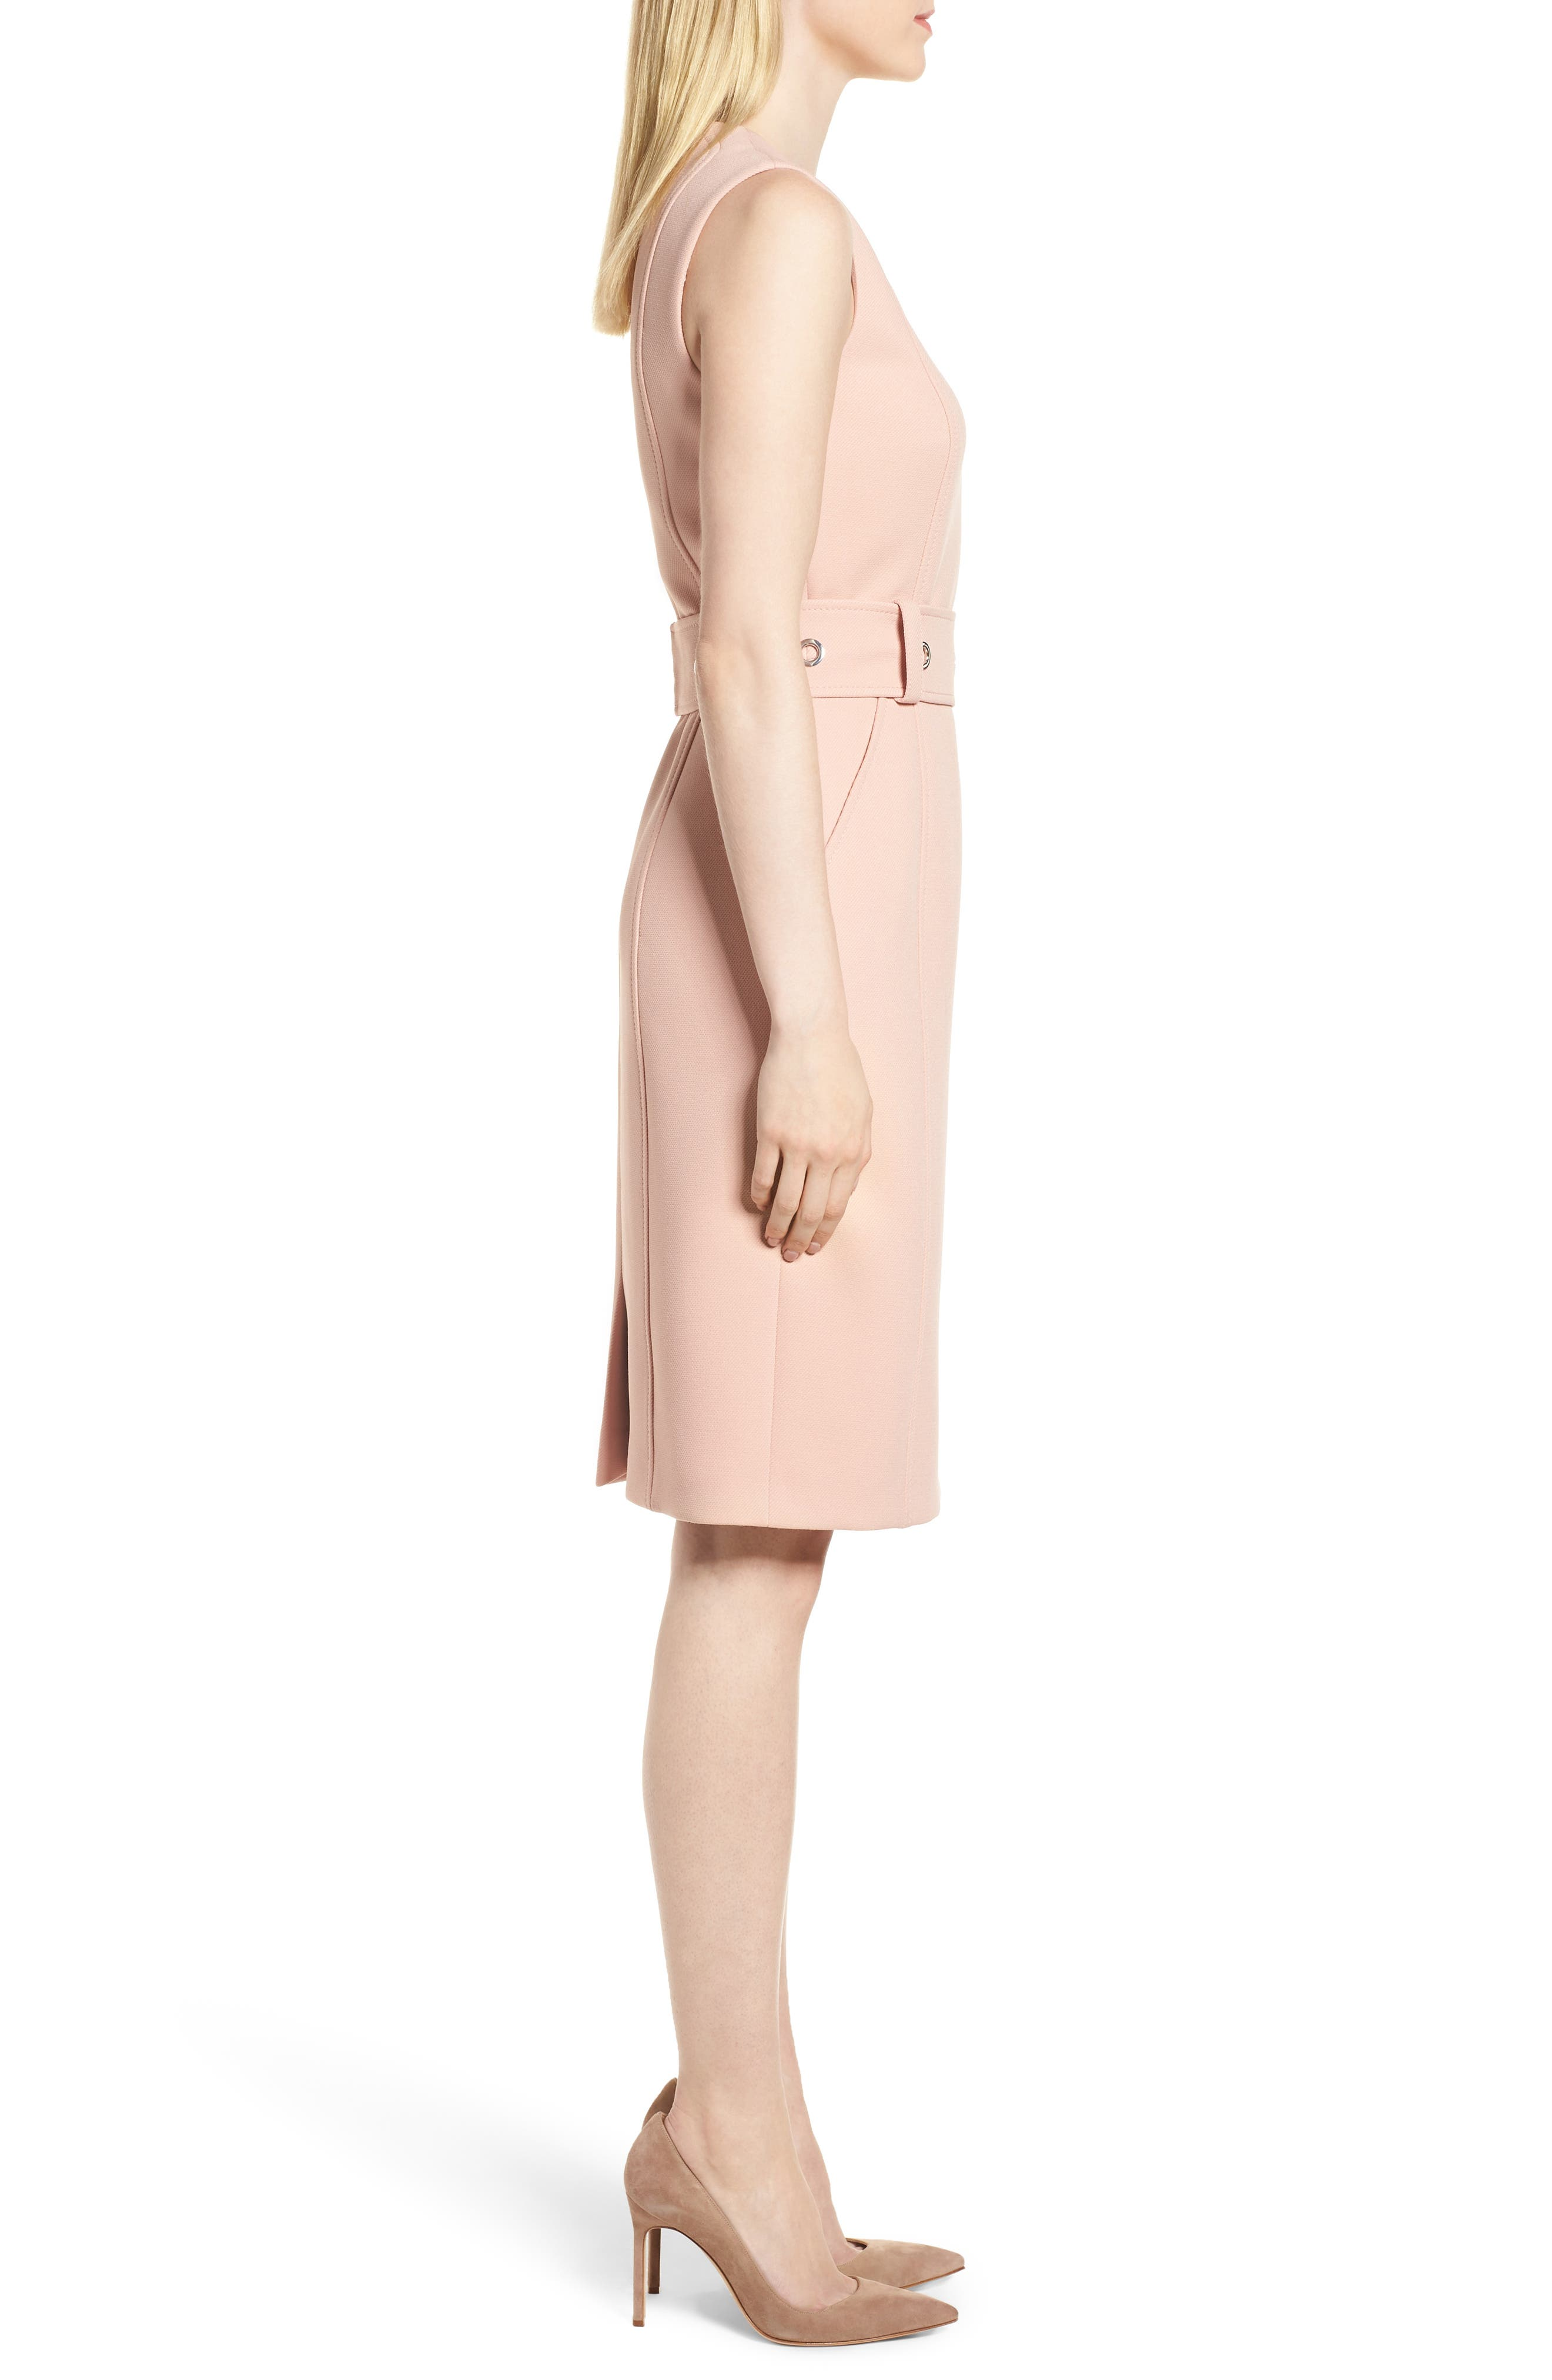 Duleama Compact Twill Dress,                             Alternate thumbnail 3, color,                             Blush